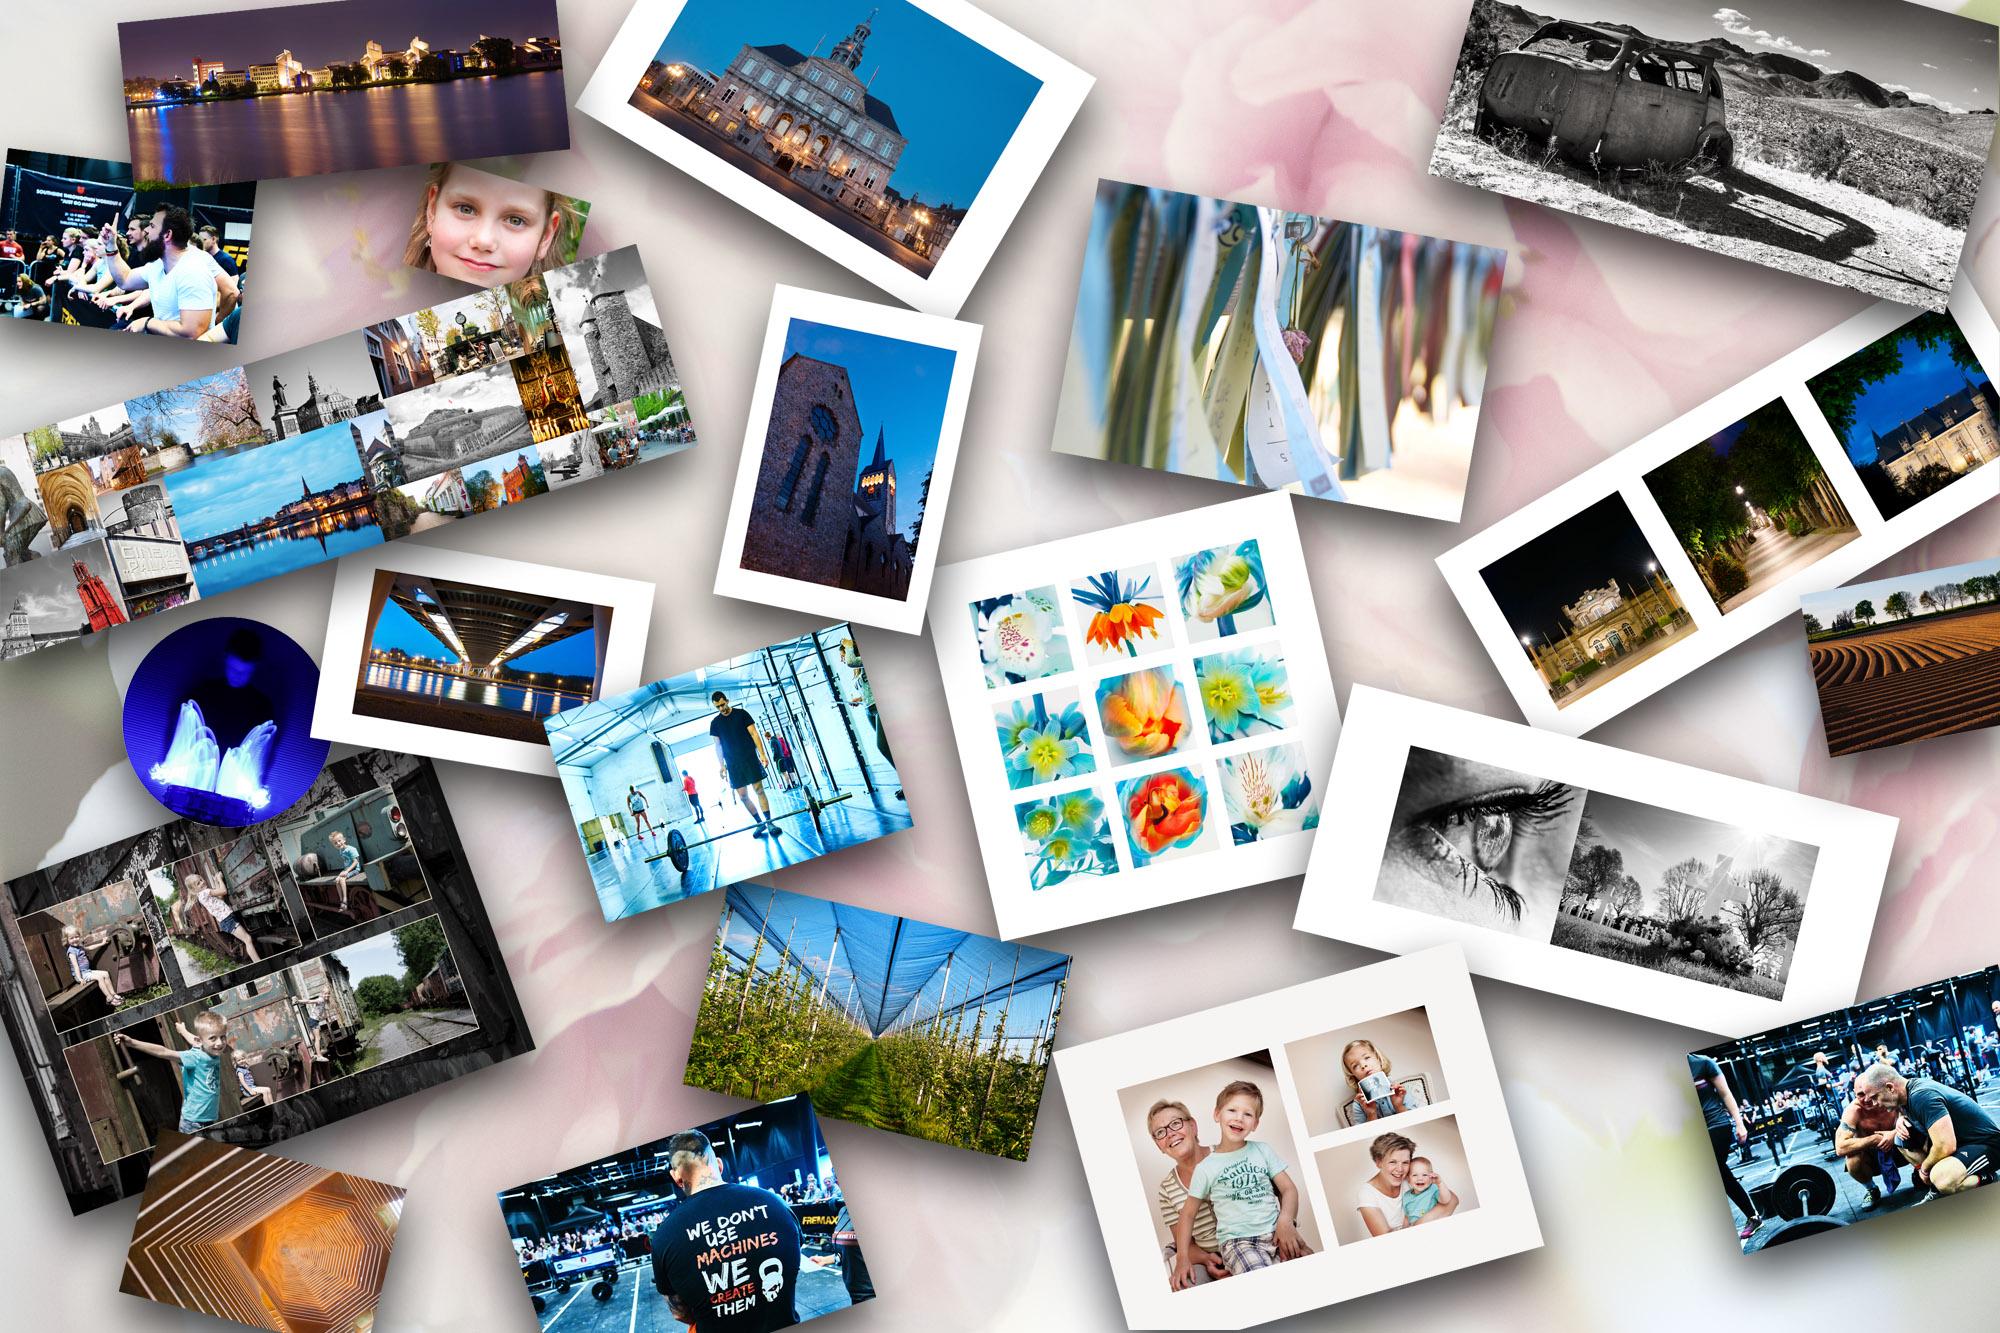 SPUISERS cursus digitale fotografie cursistenwerk 2017